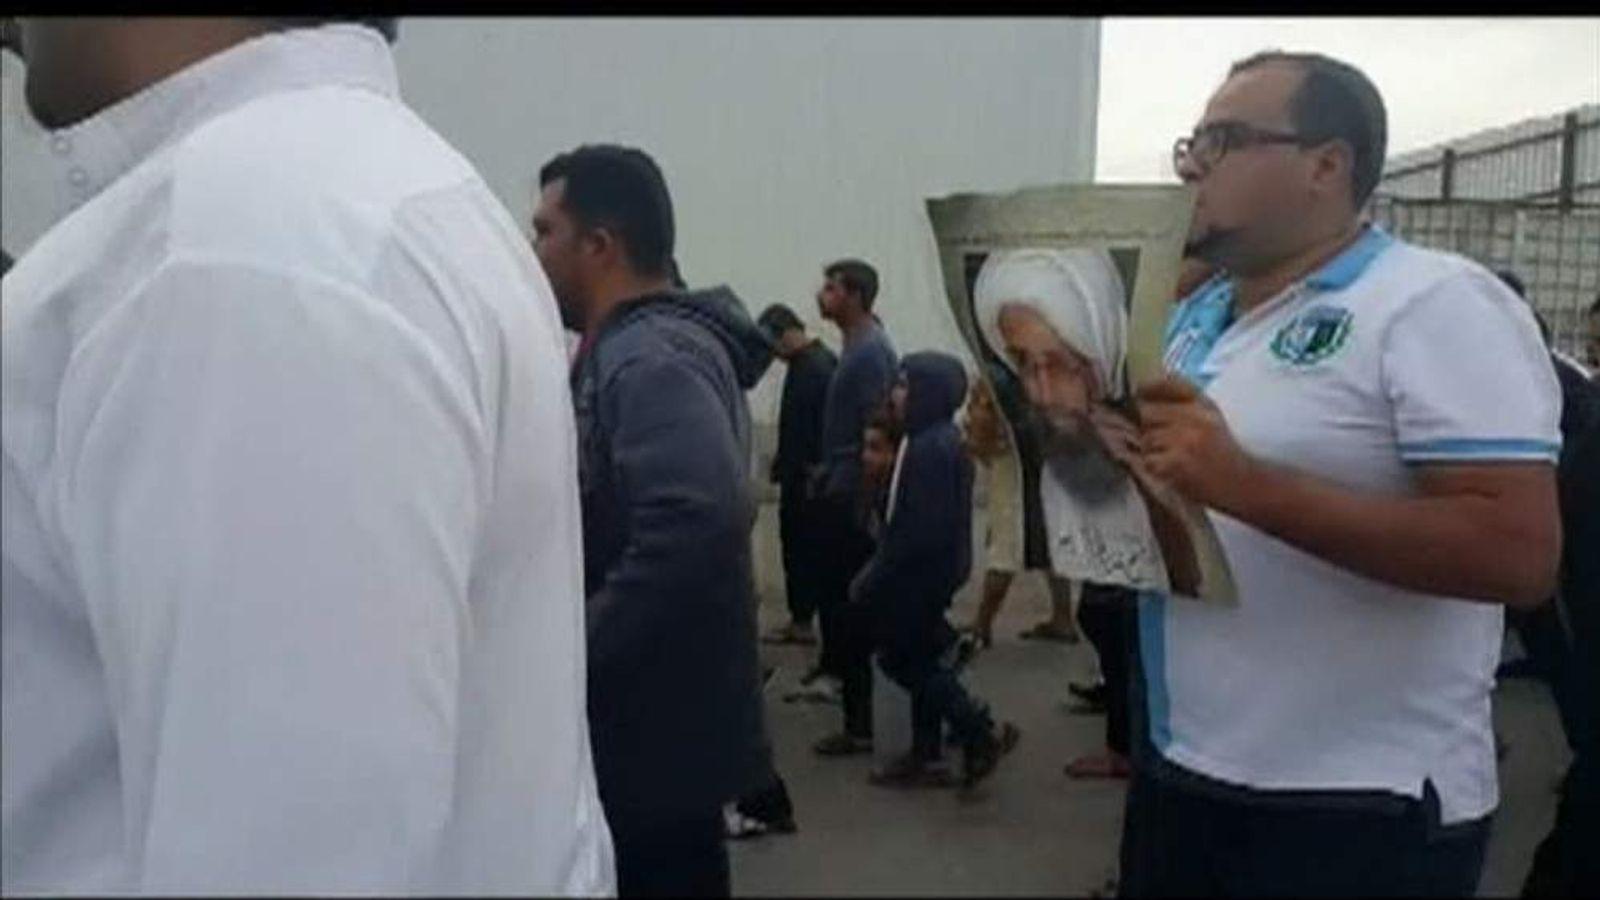 Protest in eastern Saudi against execution of Shia cleric Nimr al Nimr